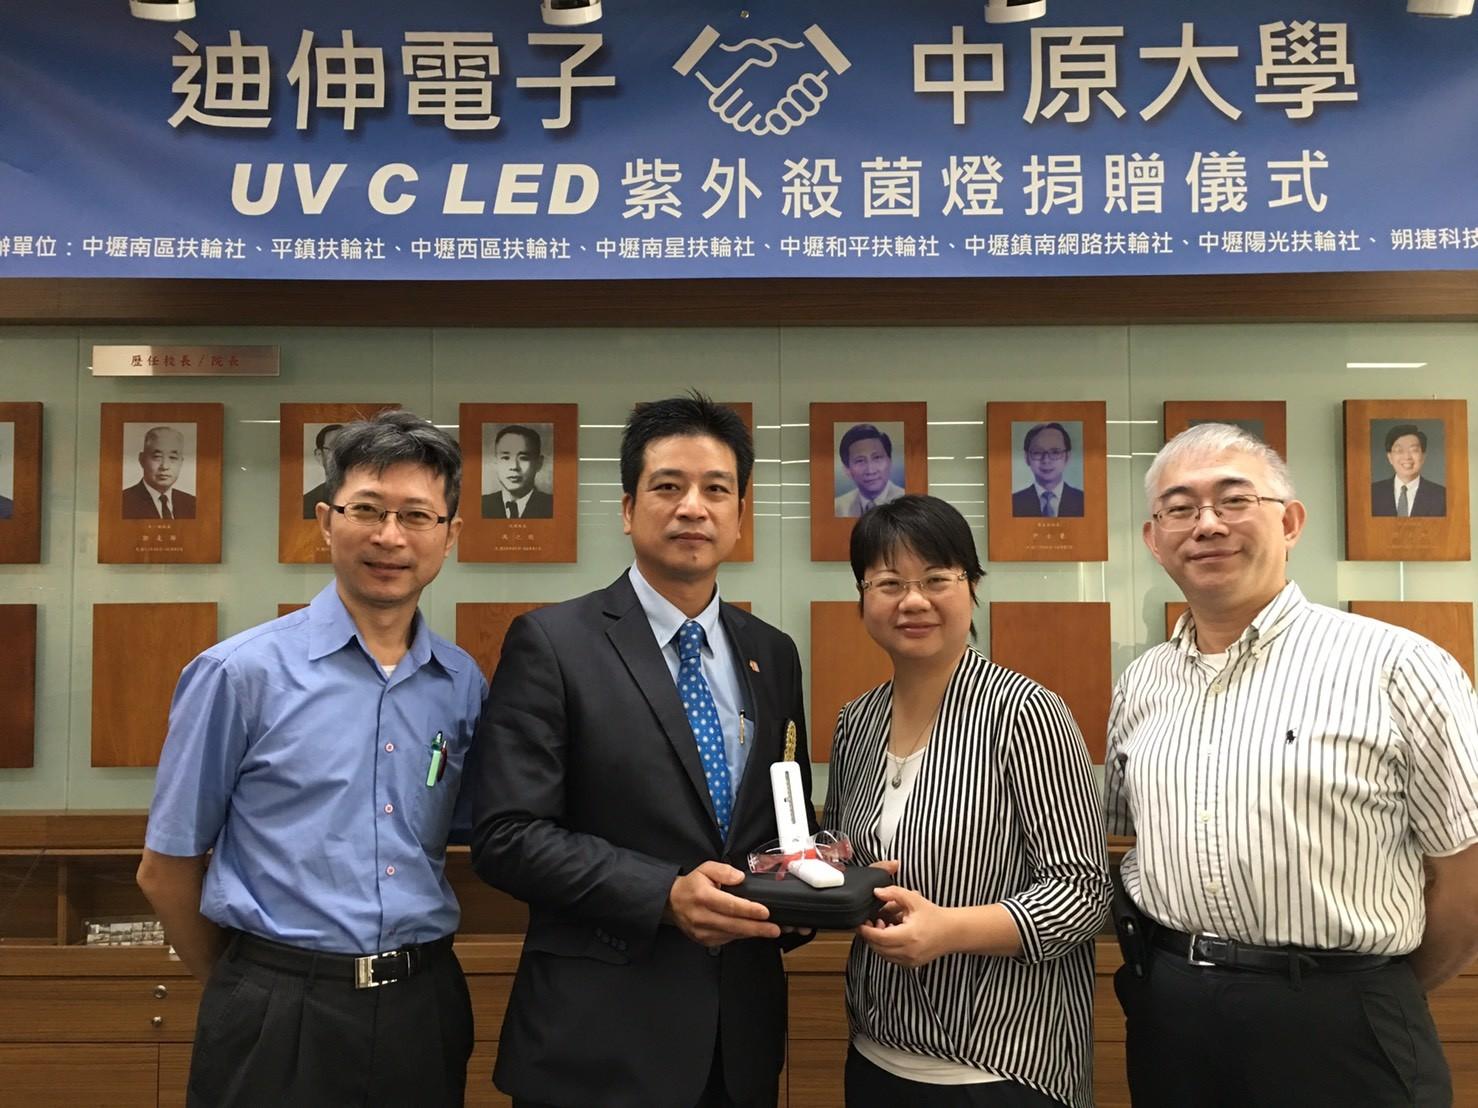 UVC LED紫外光殺菌燈為迪伸電子與中原大學產學合作的成果。(左起吳宗遠研發長、董欣志總經理、陳怡寧副教授、陳中庸主任).jpg